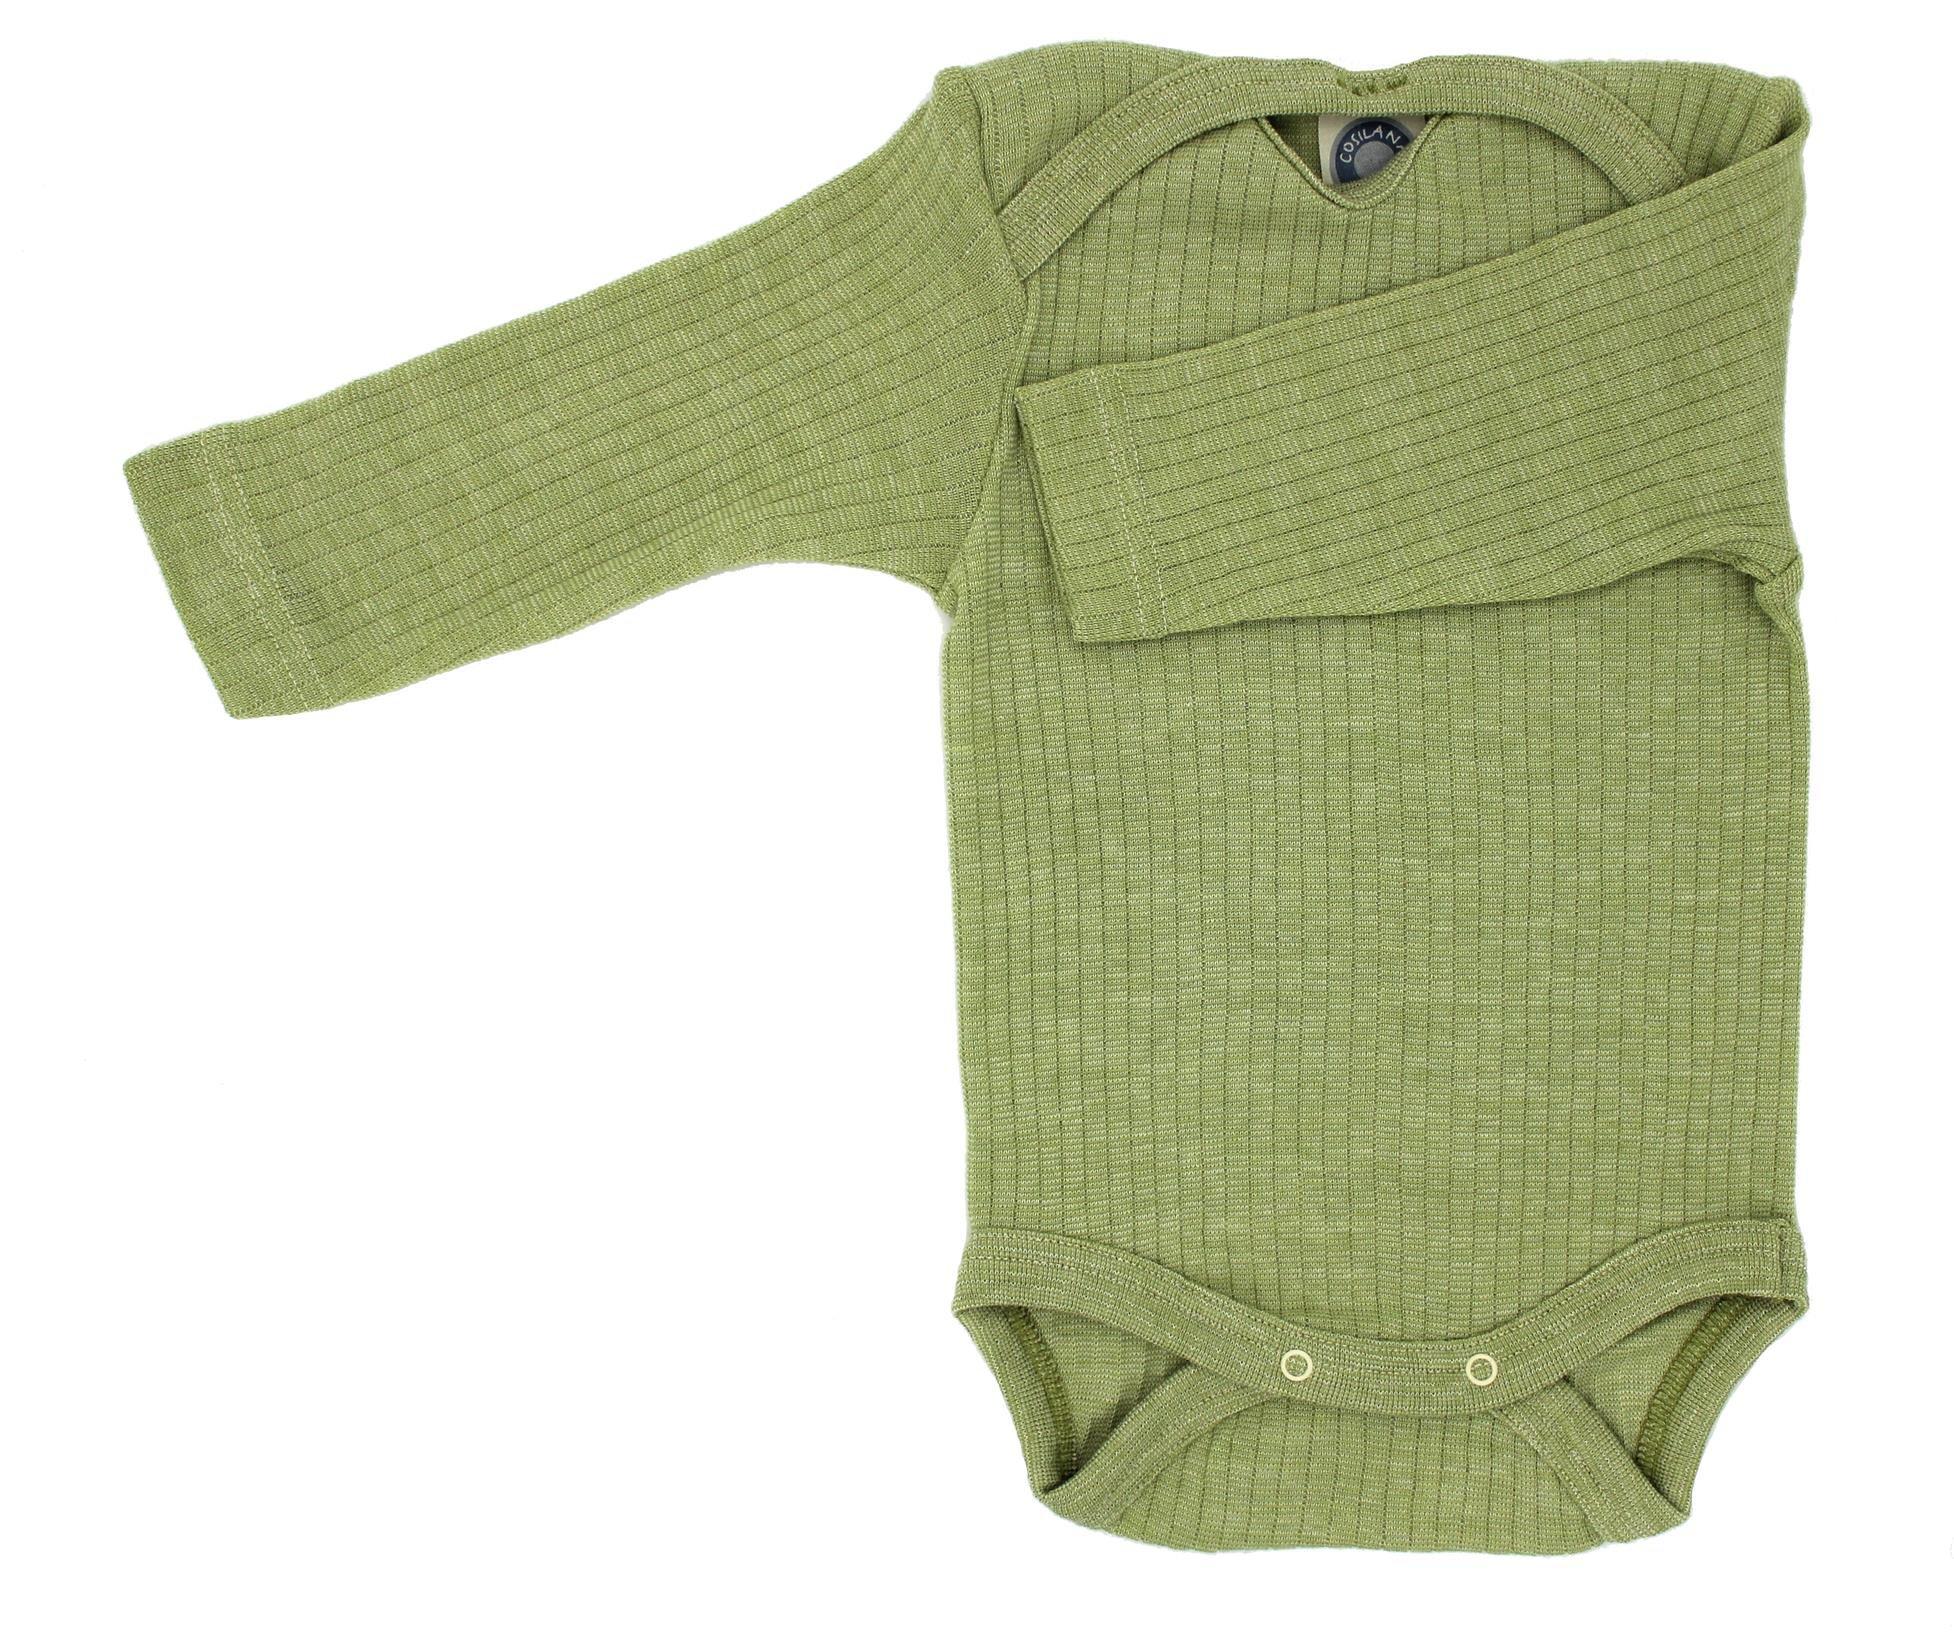 Cosi lana baby Body WOLL Body® especial calidad 45%, algodón orgánico, 35% KBT lana, 20% seda